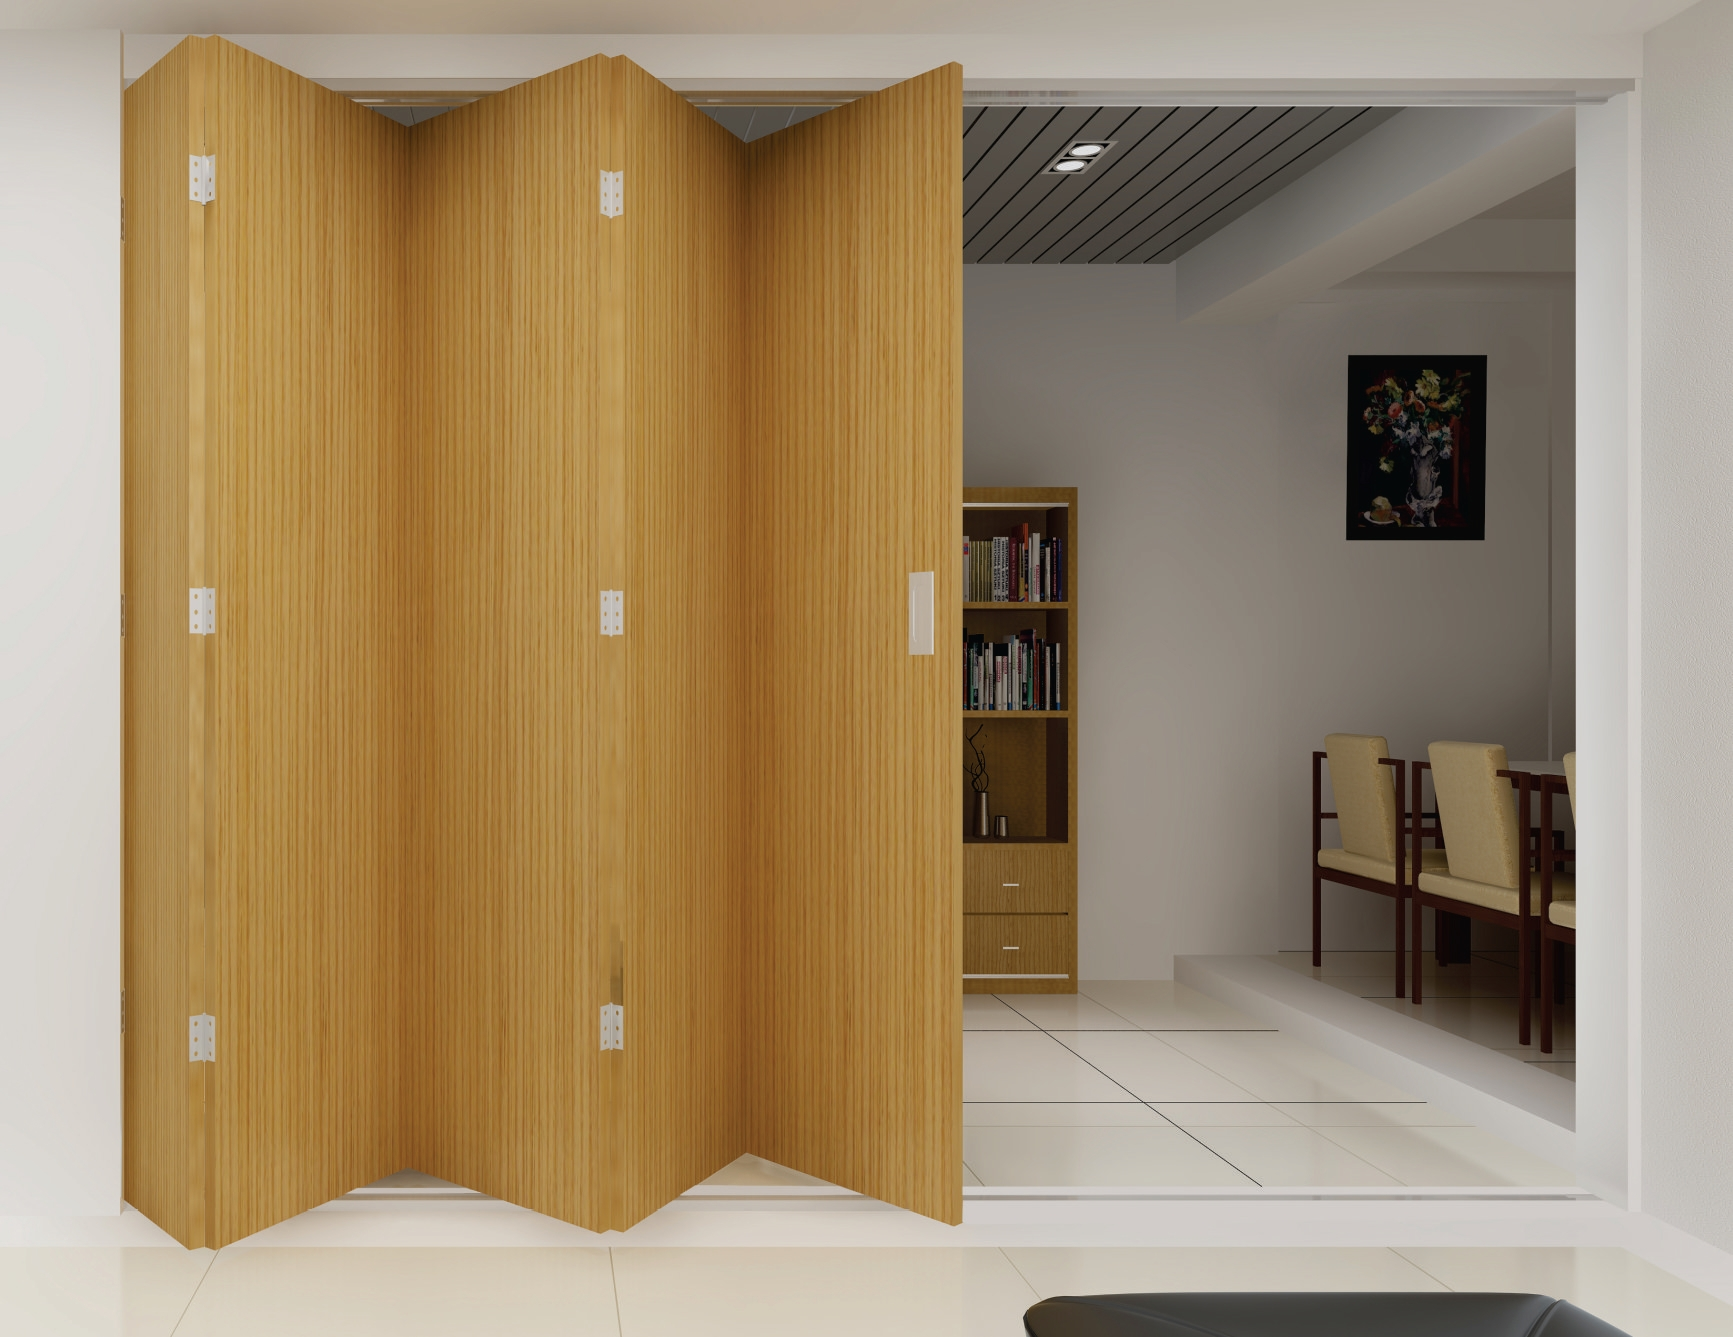 Hafele Xl Slide Pocket Door System Sliding Doors